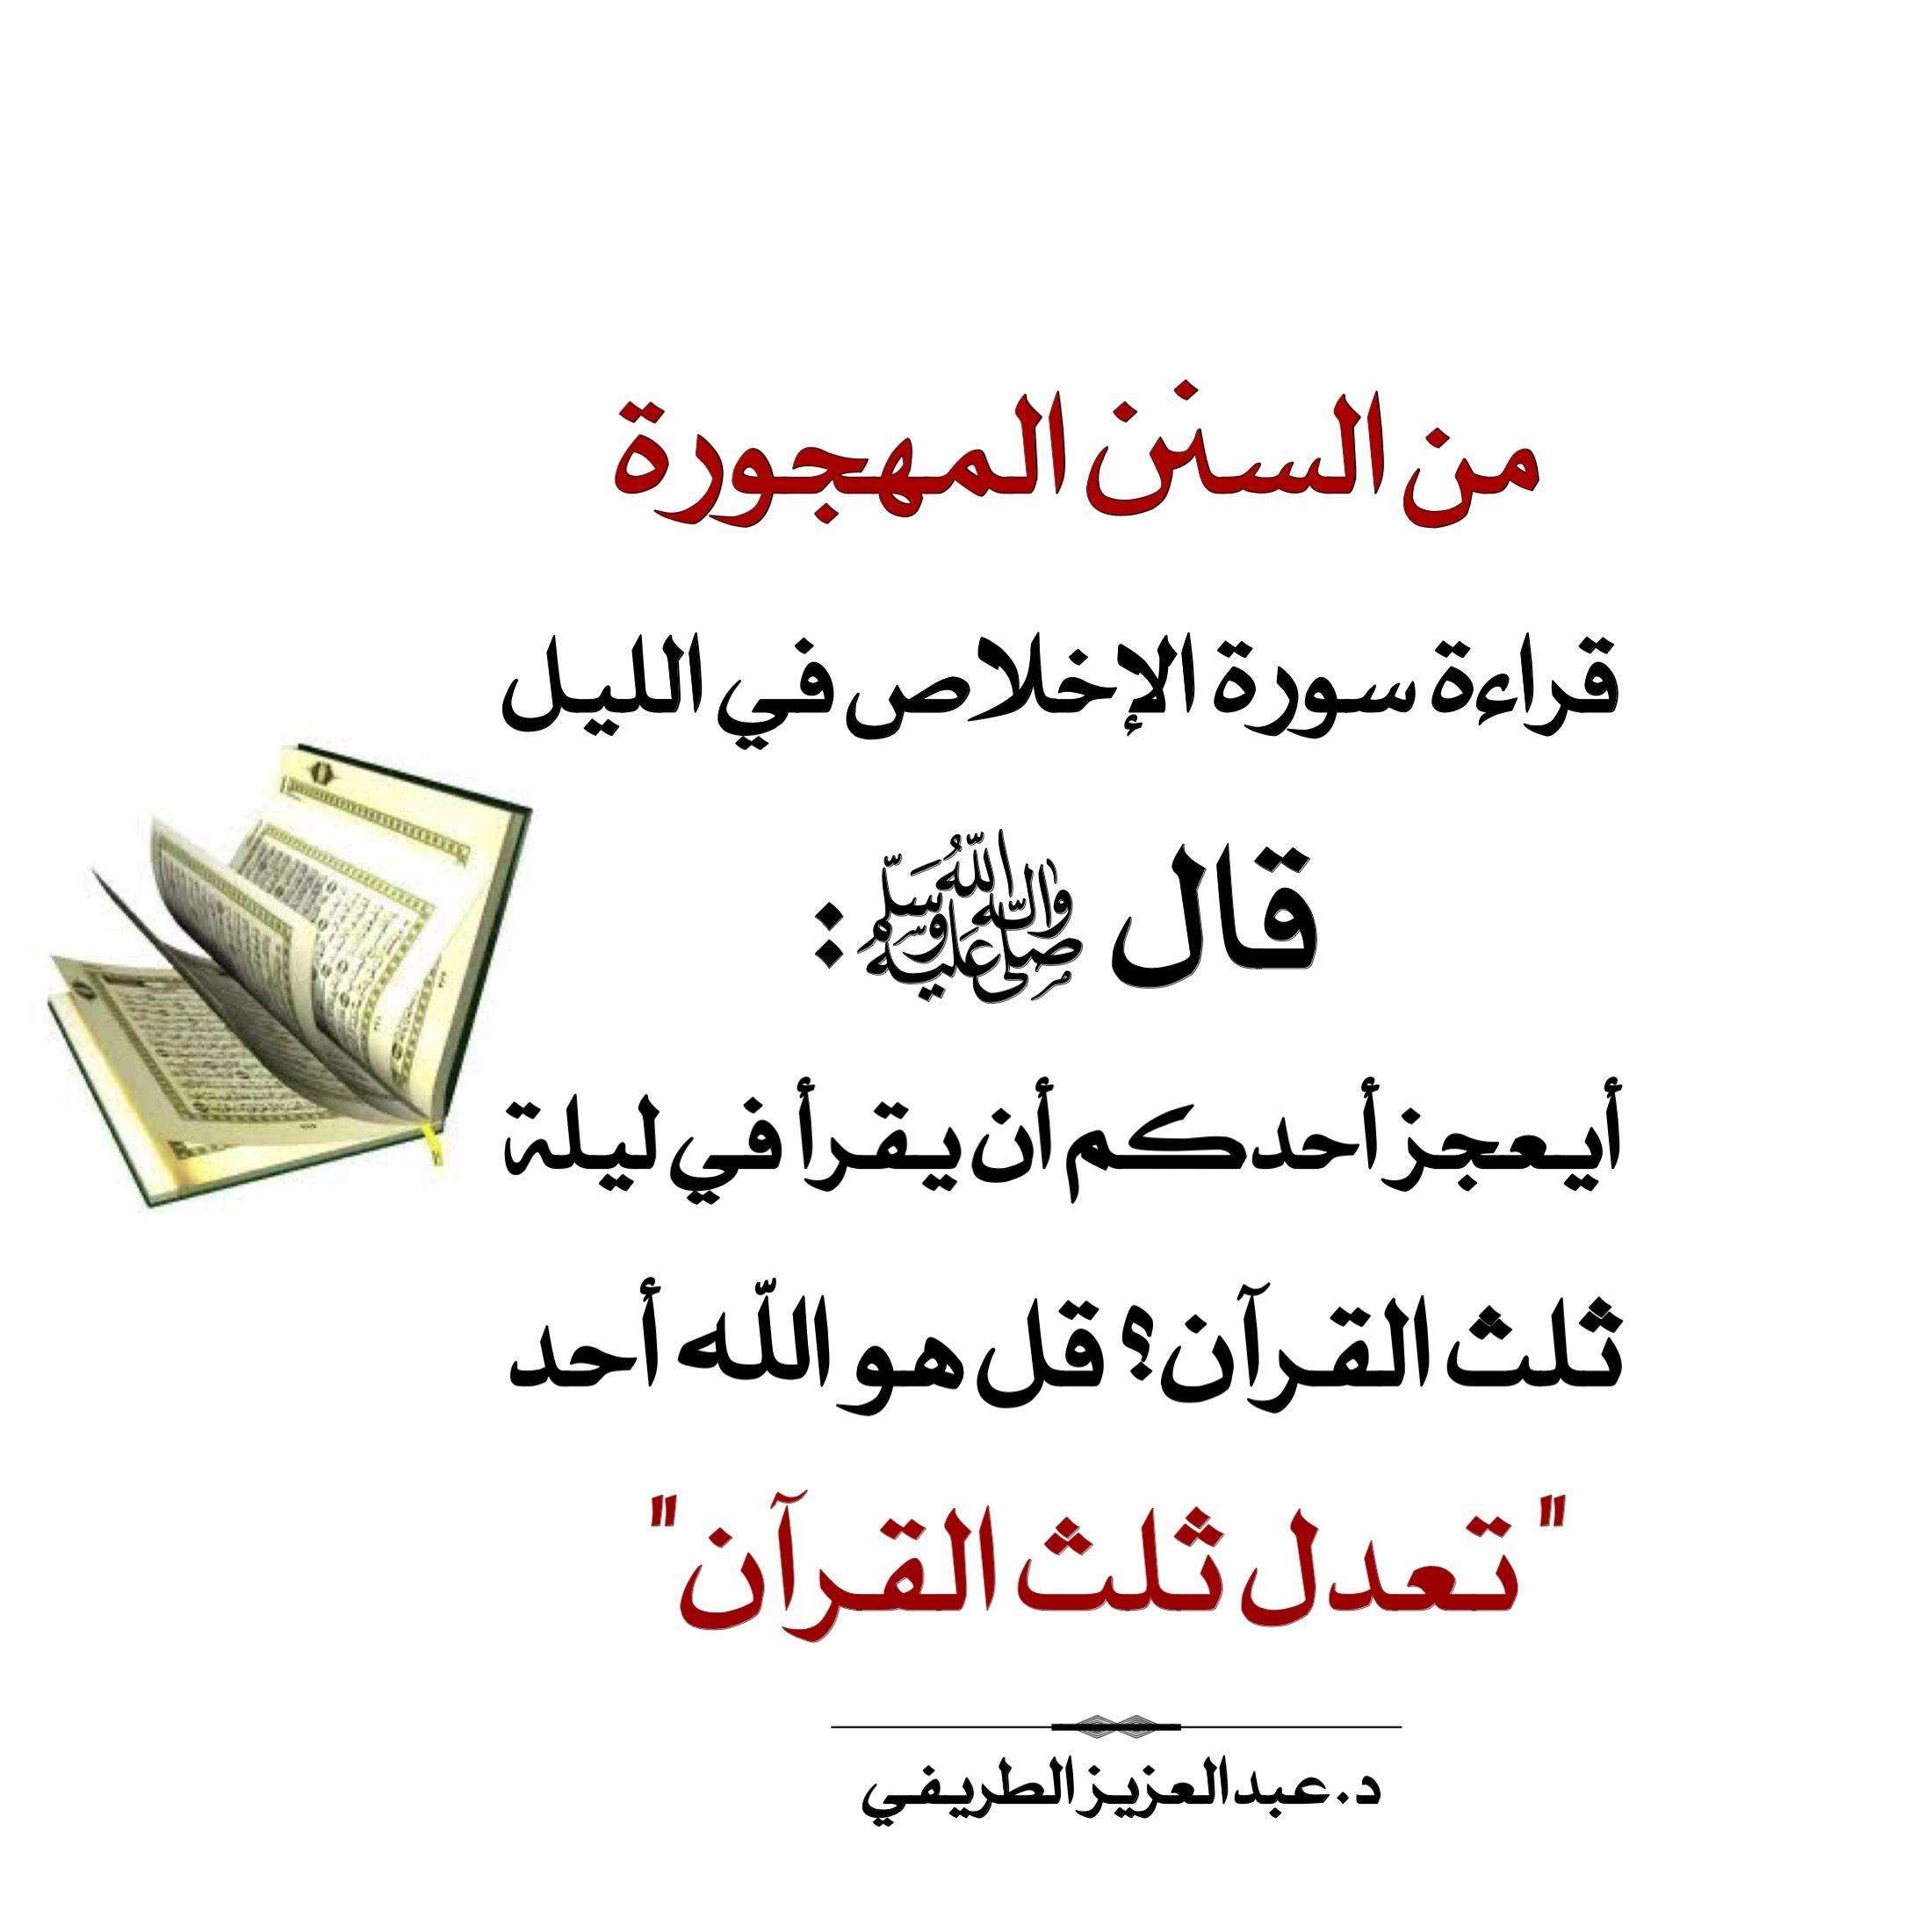 Pin By الأثر الجميل On أقوال الصحابة والعلماء In 2021 Islamic Quotes Islam Quotes